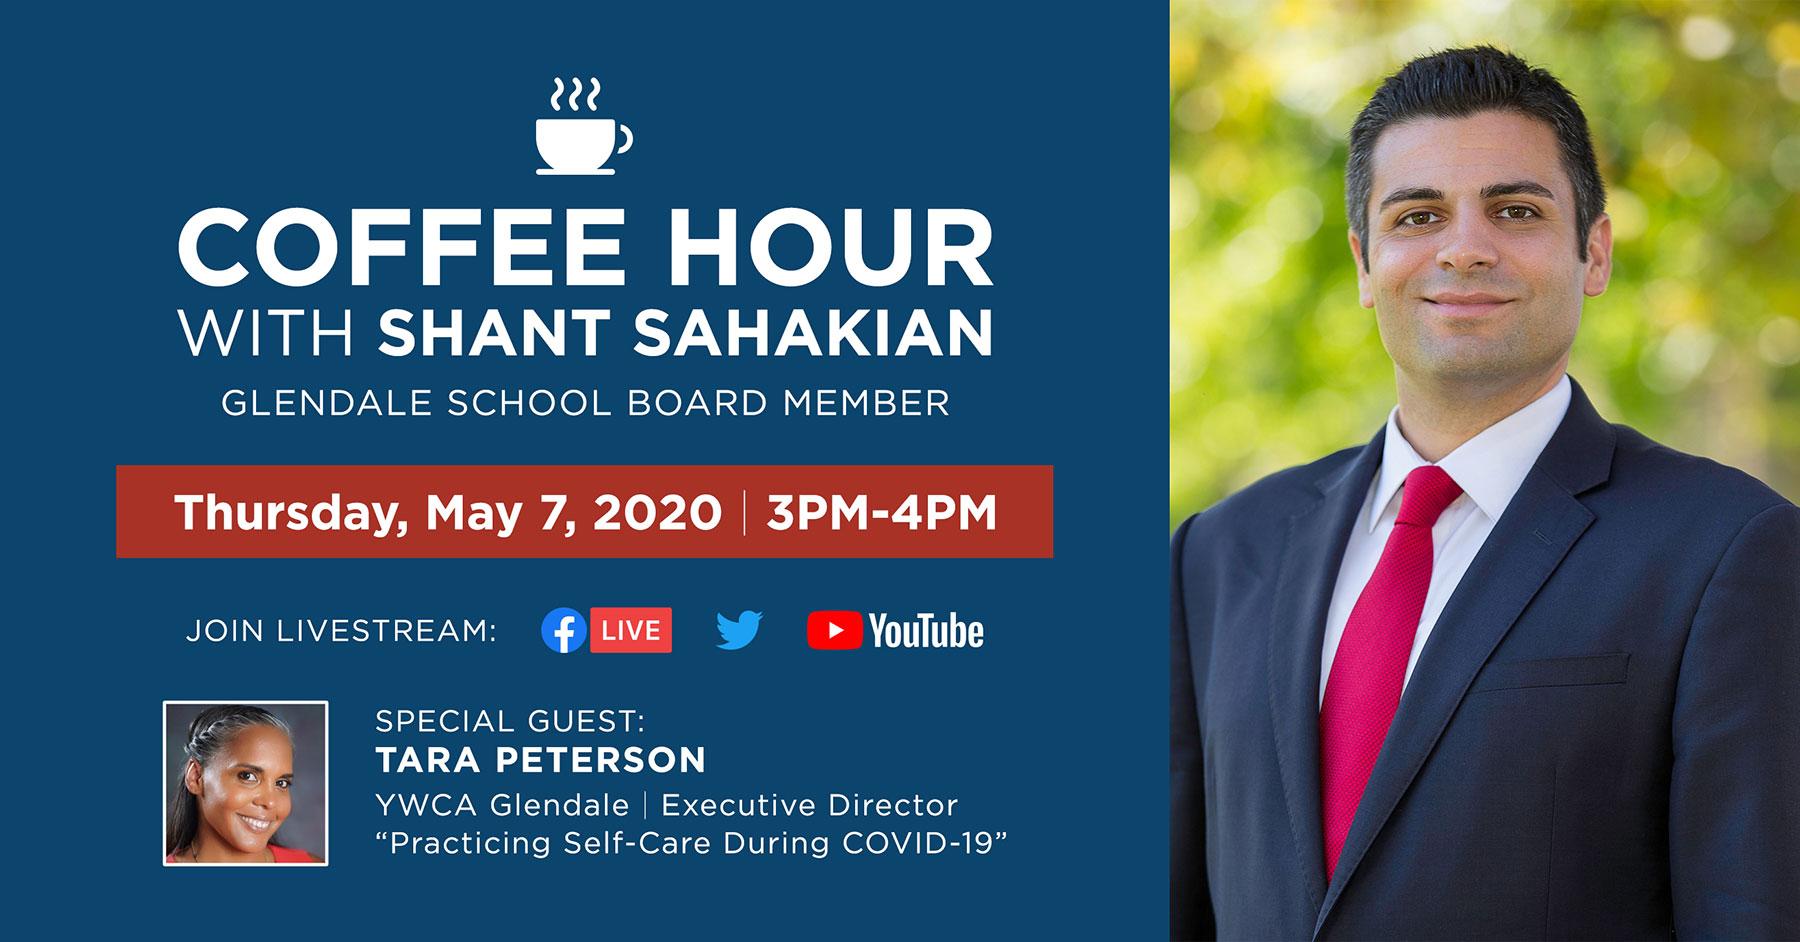 Glendale School Board Member Shant Sahakian Coffee Hour Event Flyer